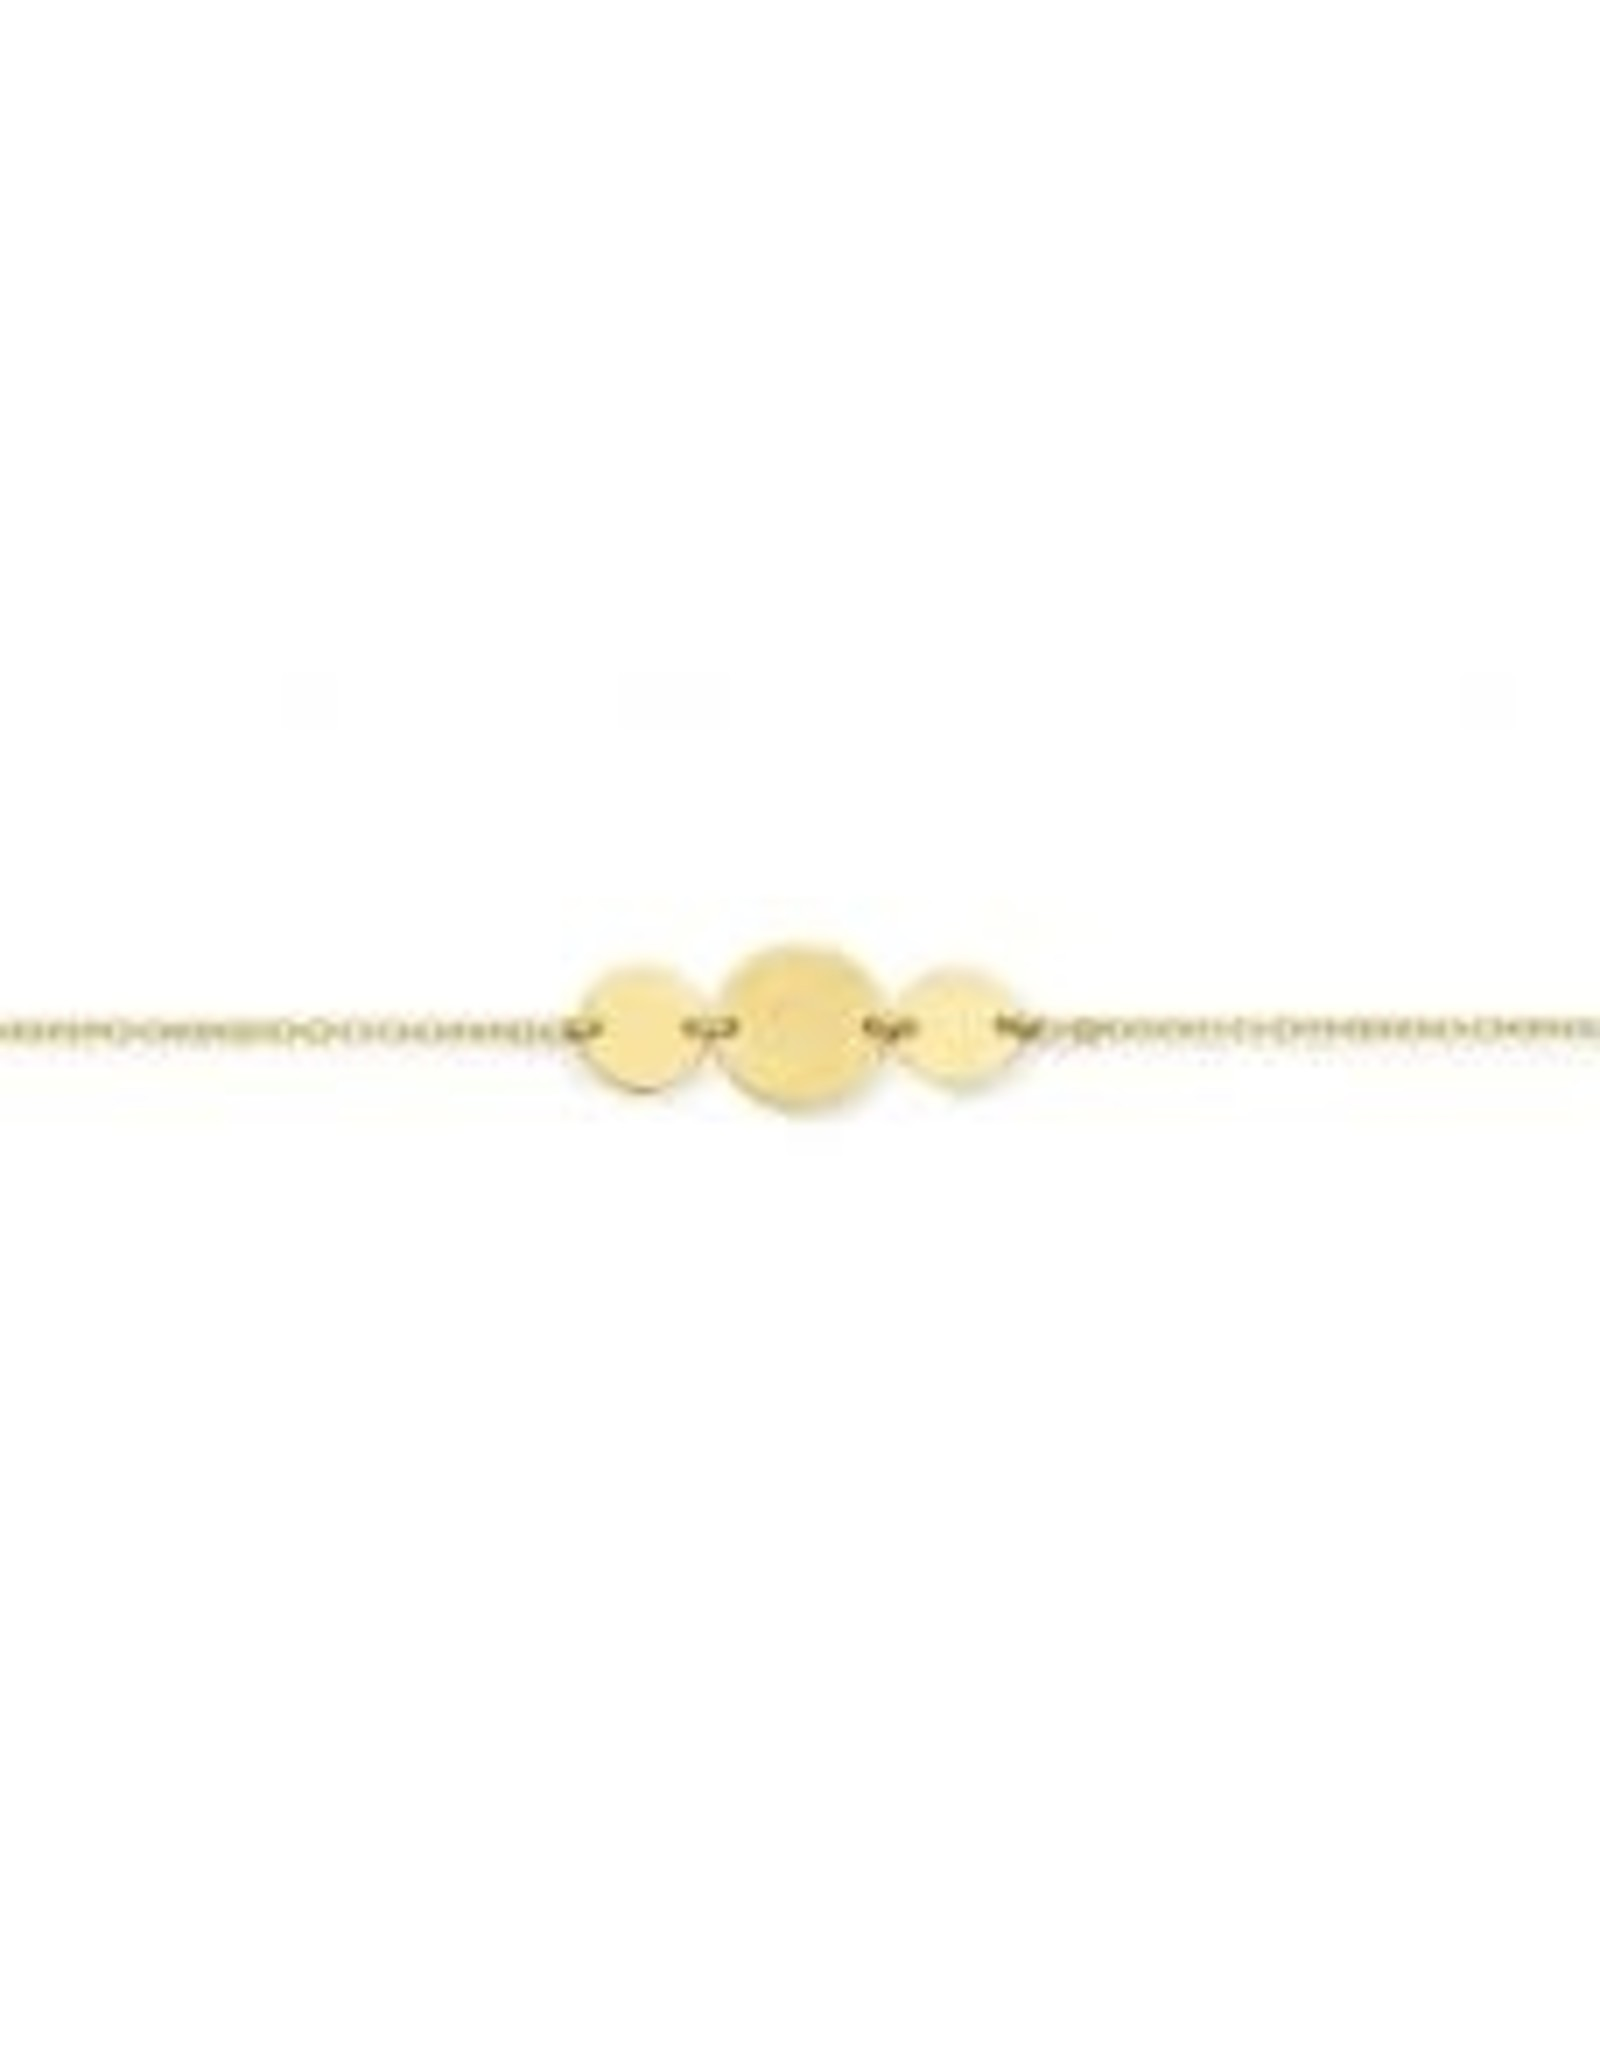 Armband Geel Goud 18kt PB1274G 18 cm